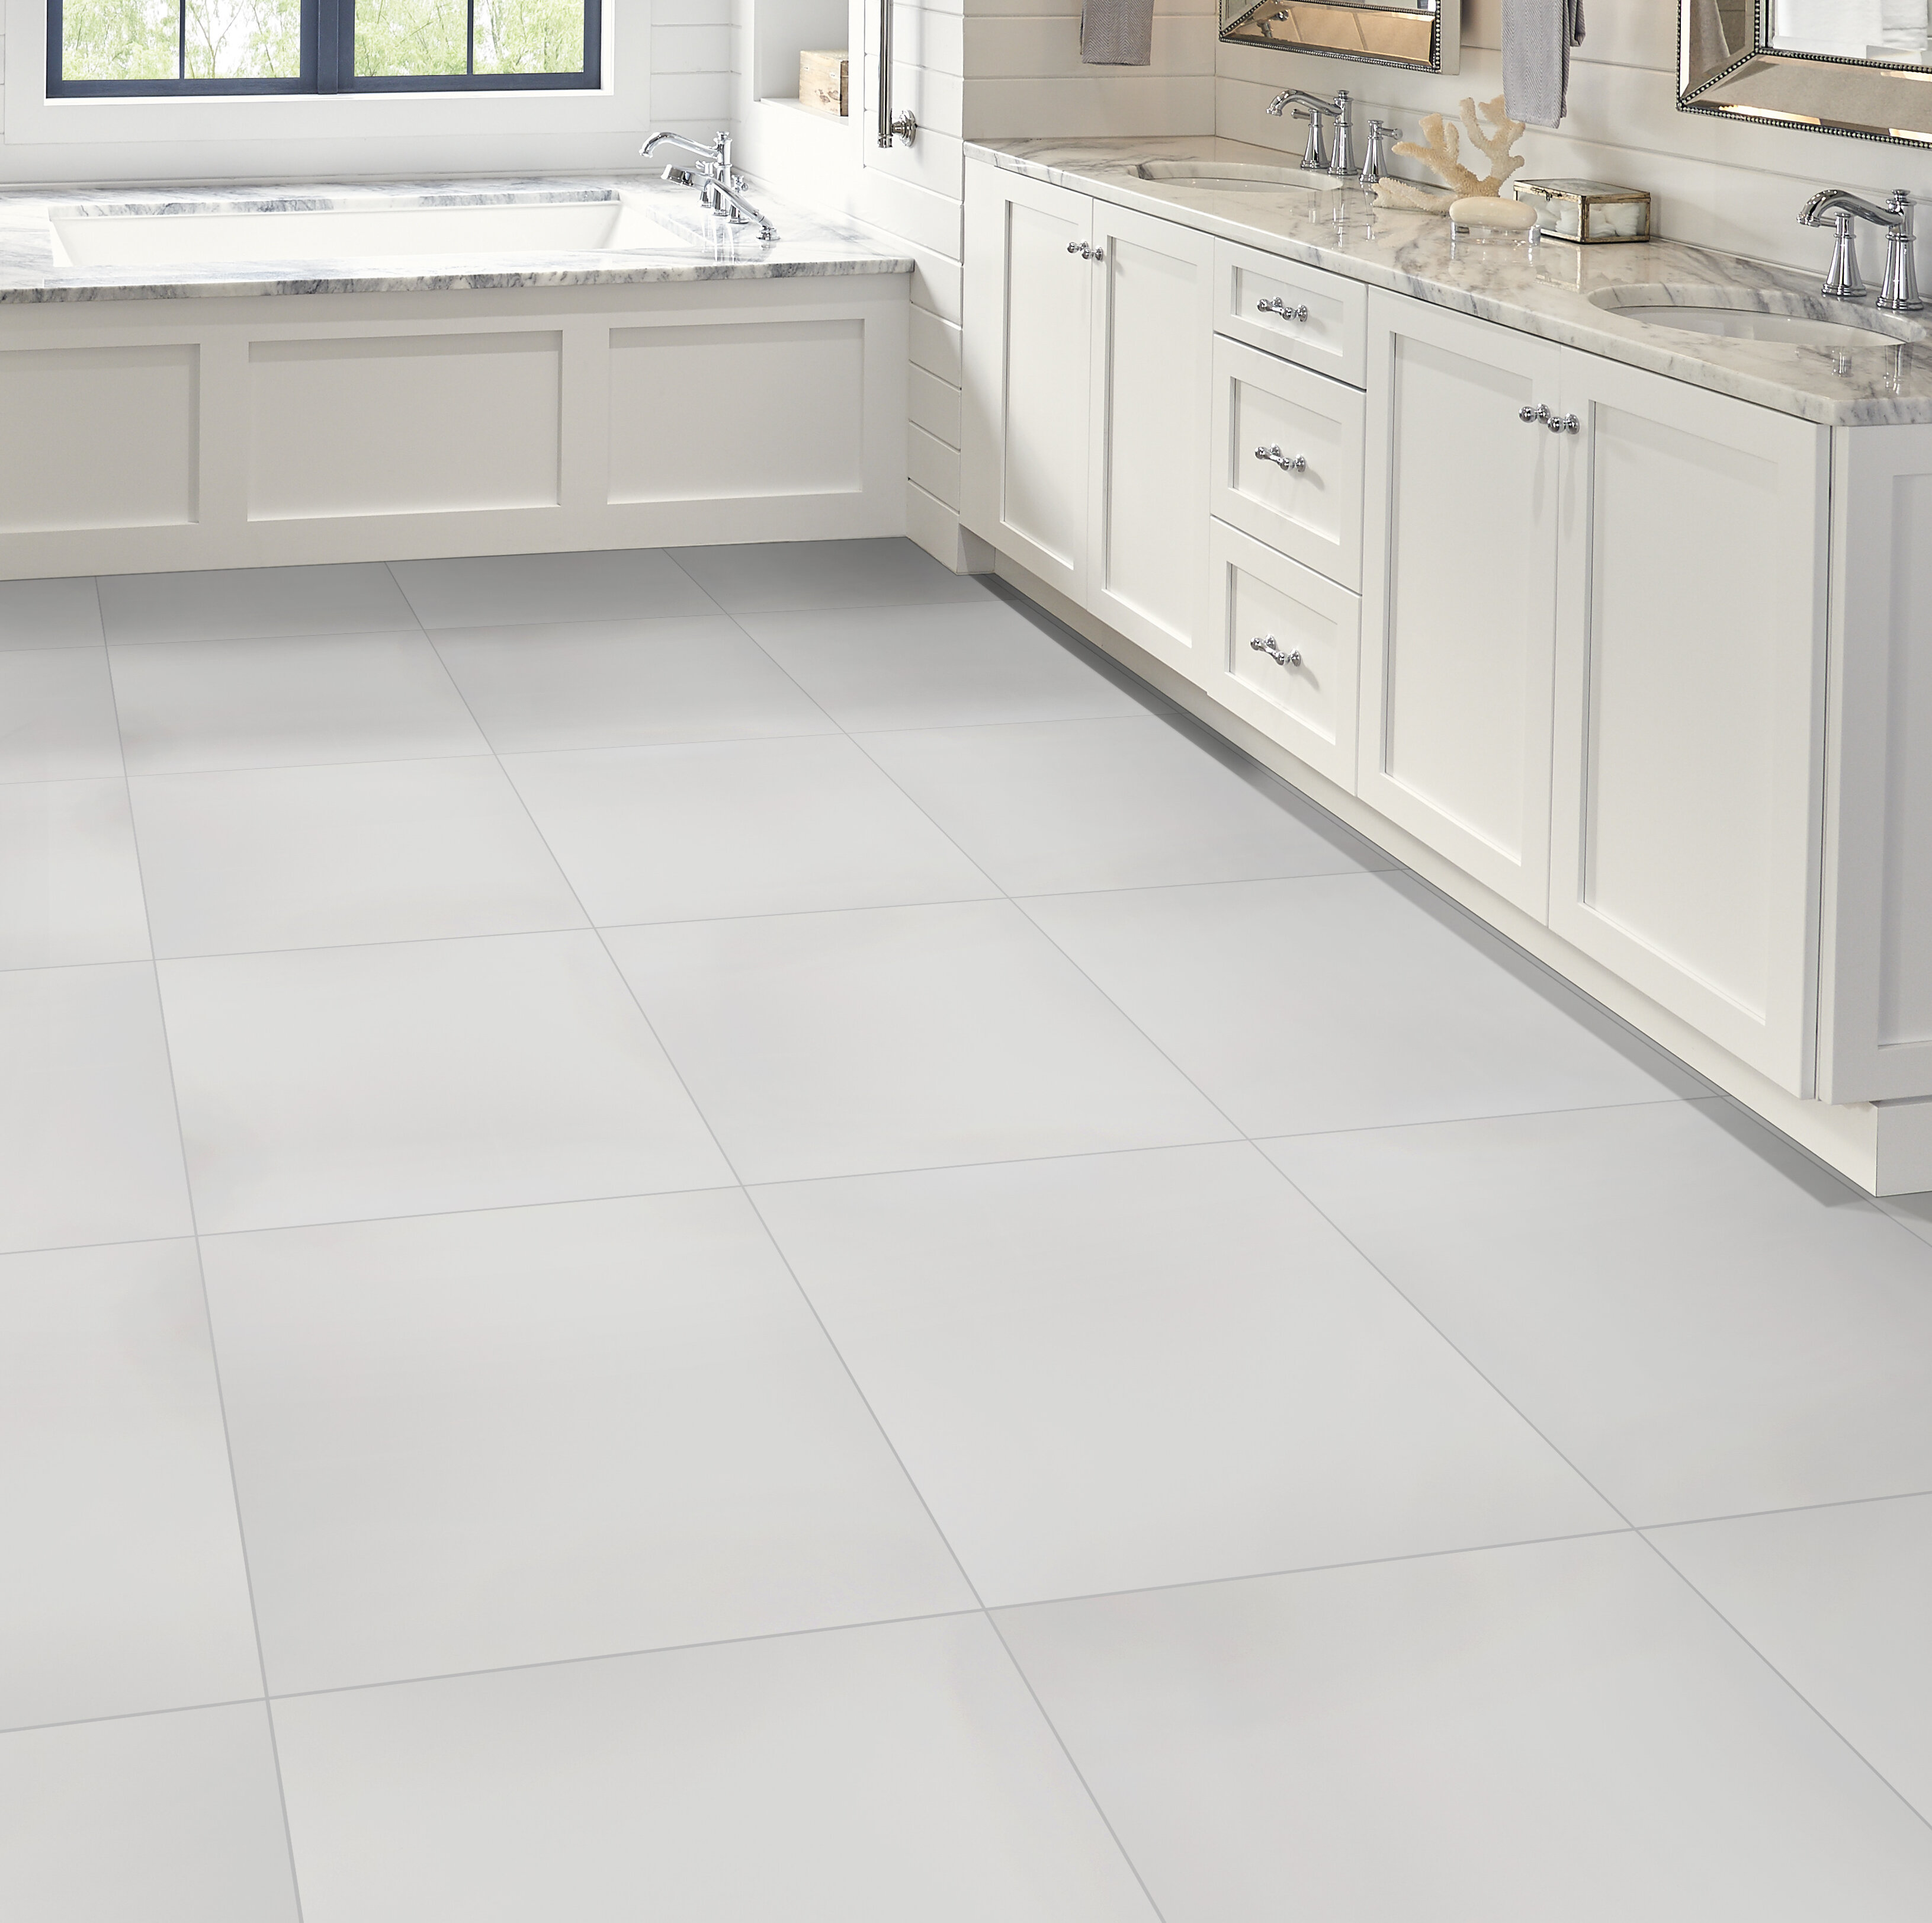 Msi 24 X 24 Porcelain Wall Floor Tile Wayfair